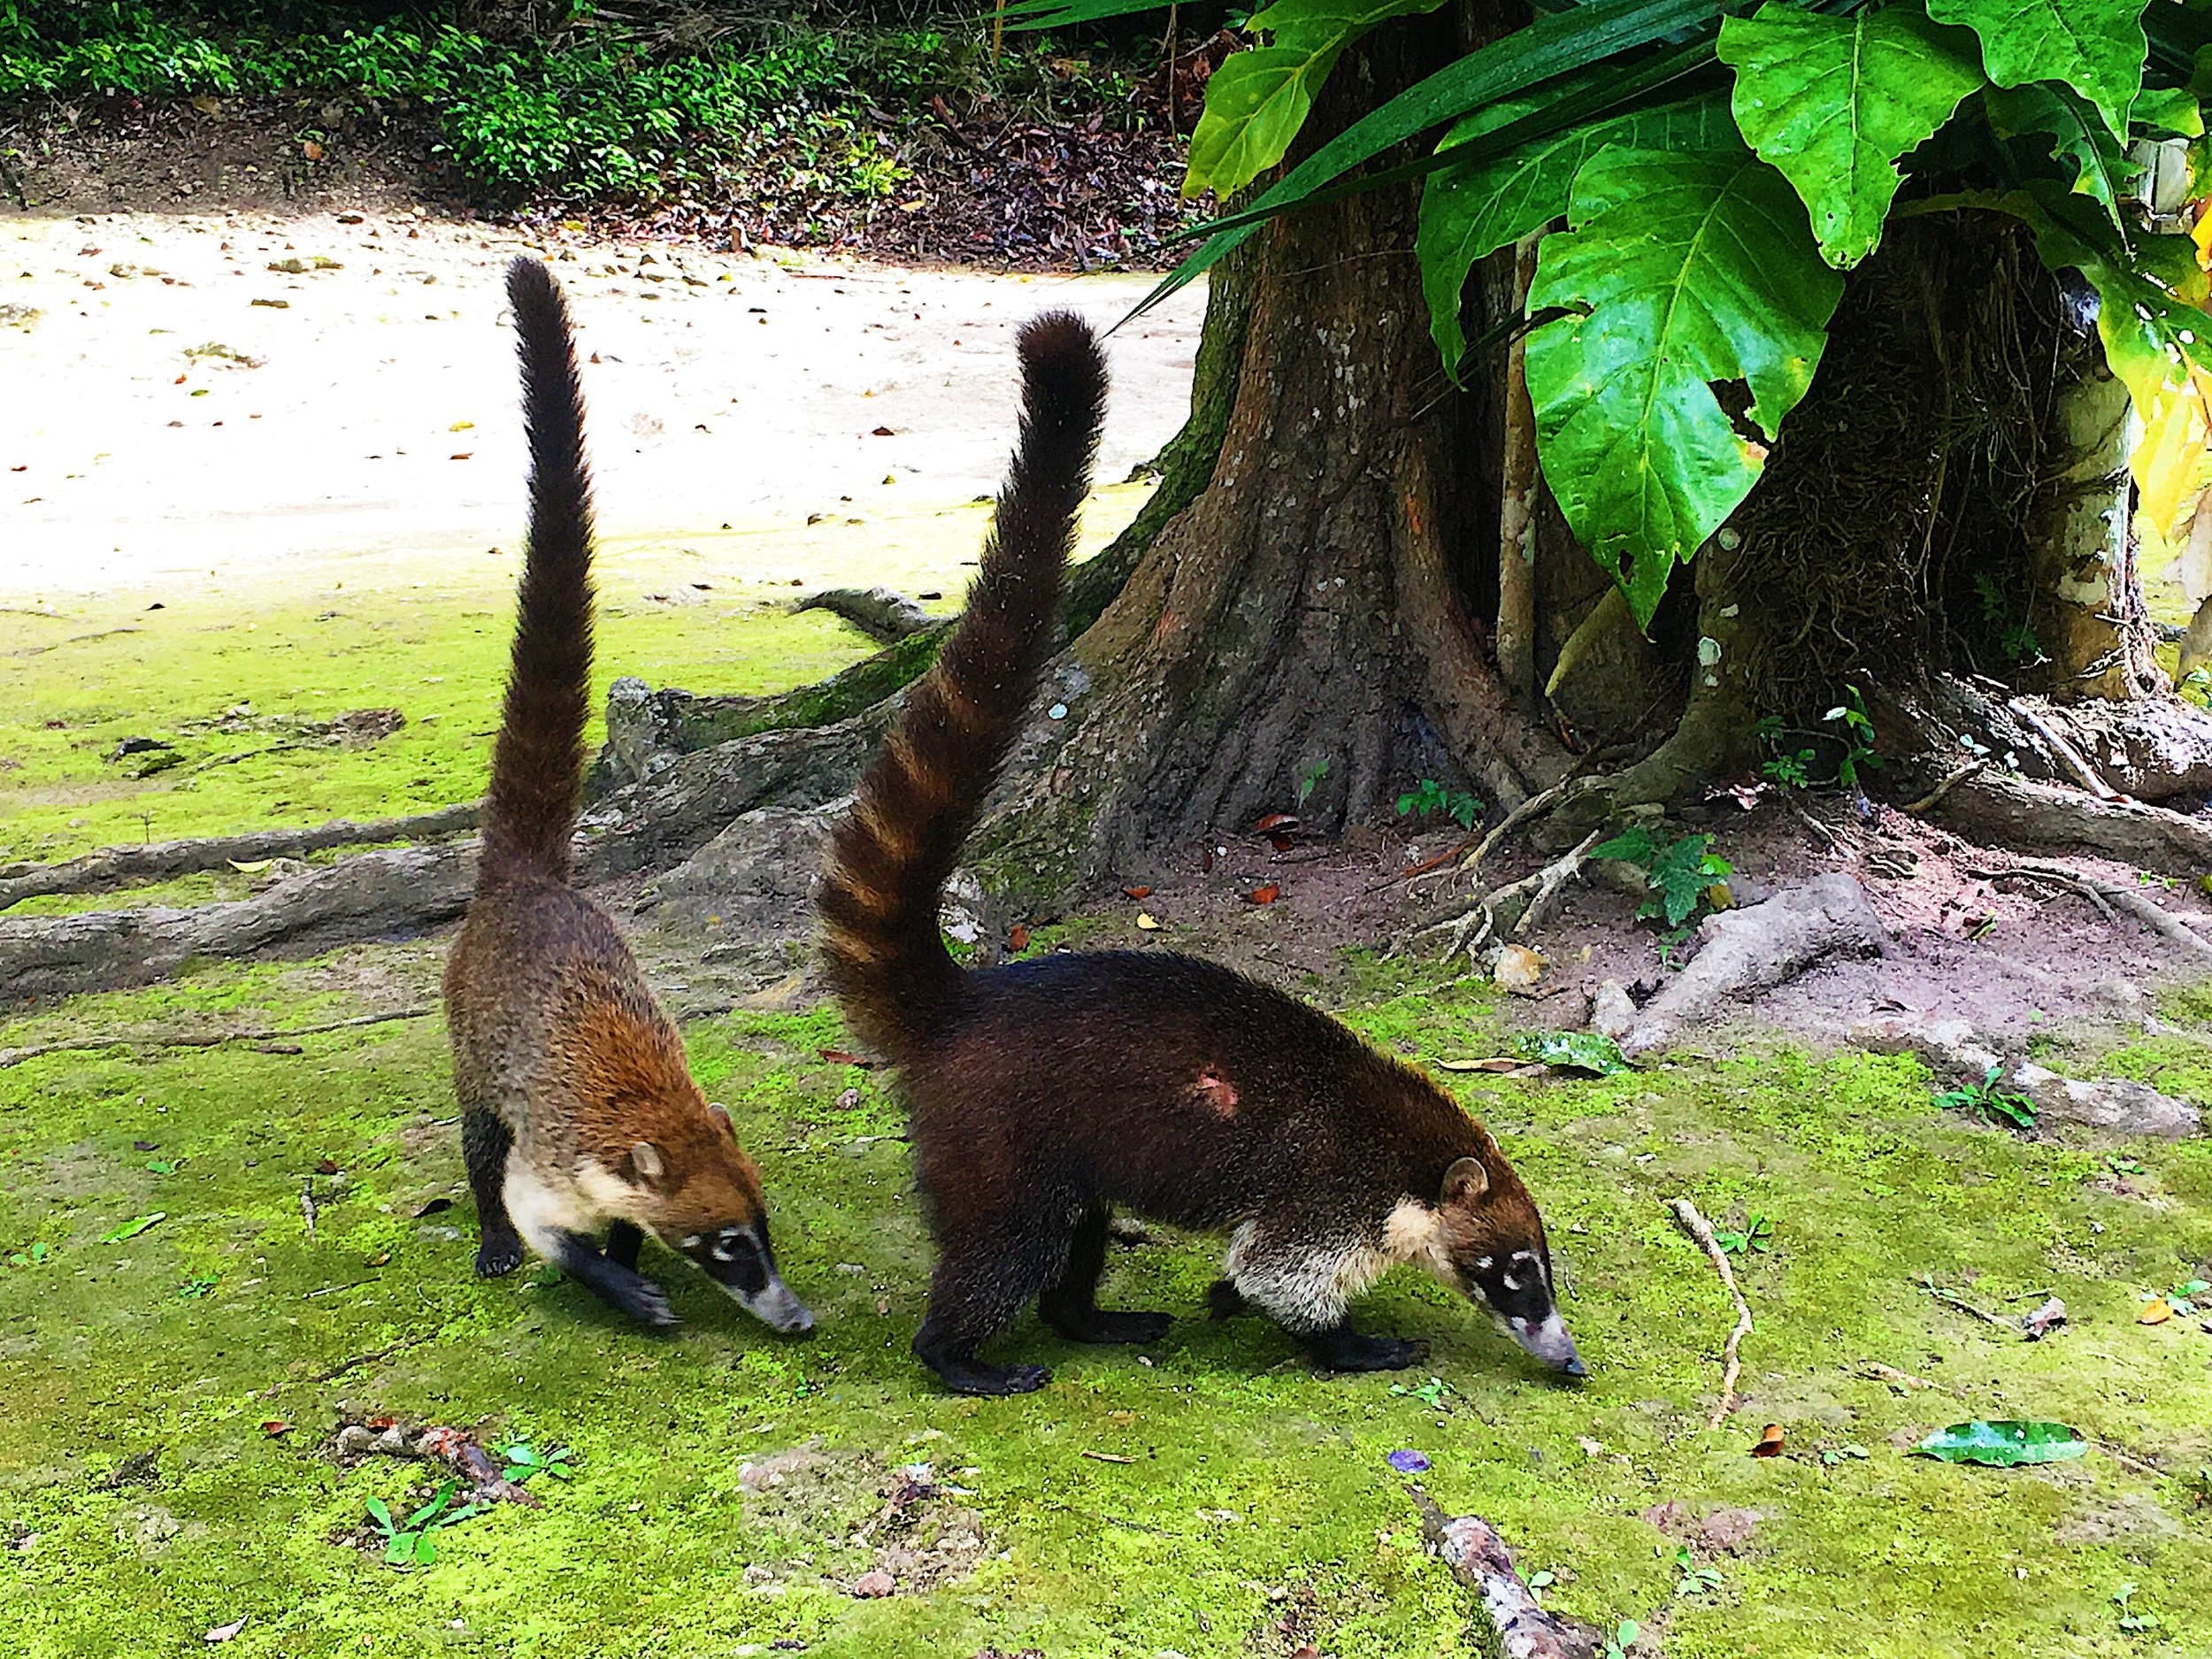 Coatamundi sniff the ground at Tikal National Park. Photo by Chic Travels.